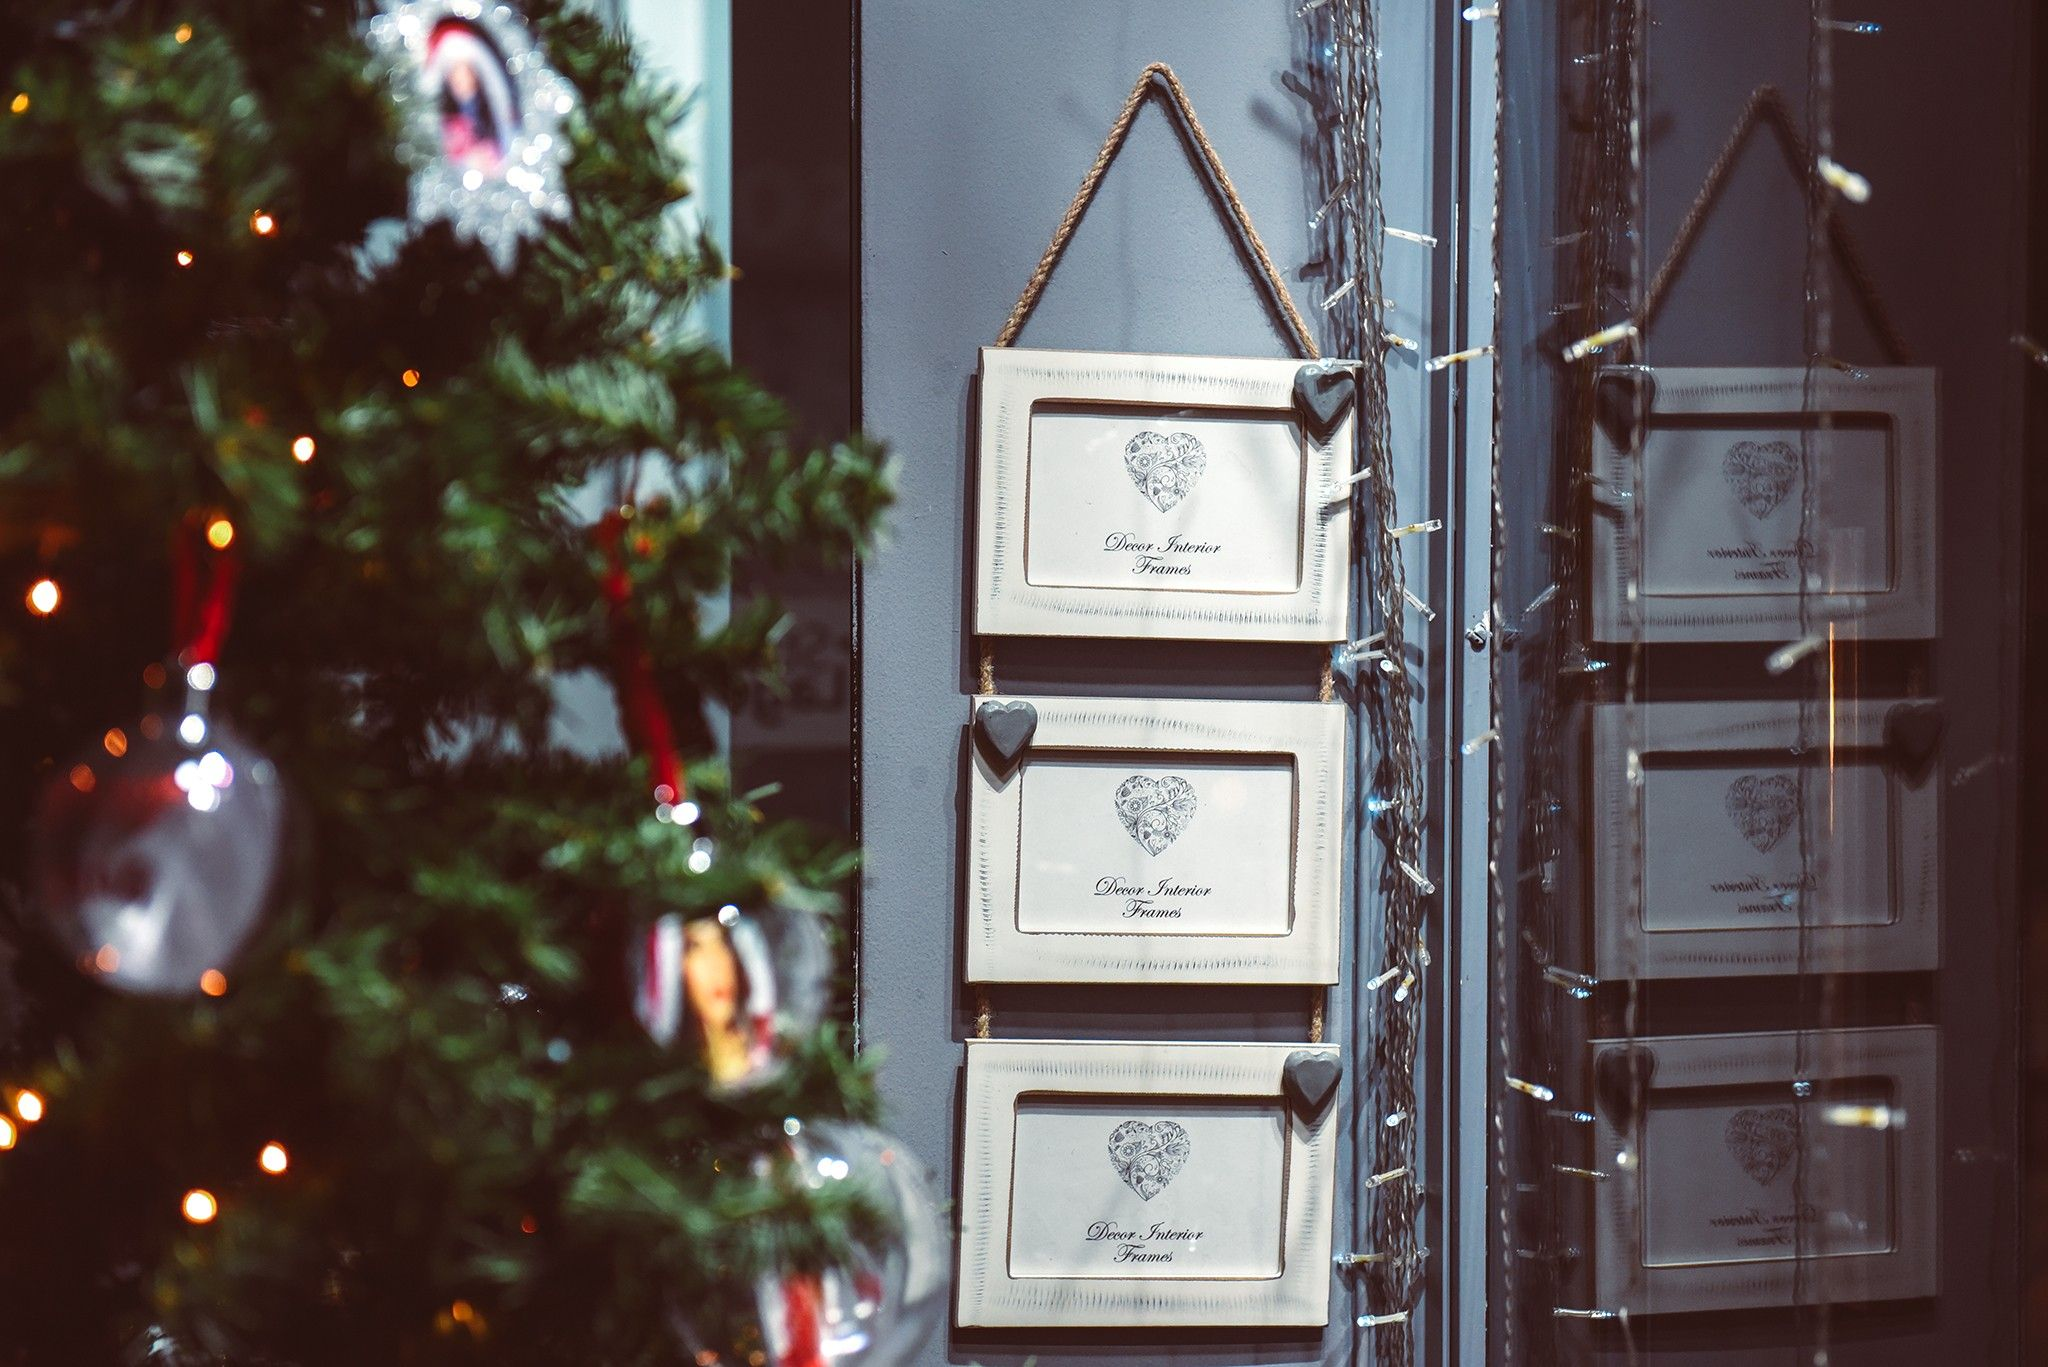 #MerryChristmas #xmas #Christmas #HappyNewYear #December #winter #christmasdecoration  #christmasgoals #Sepolia #Athens #Greece #StudioLagopatis #visitGreece #greecestagram #igers #igersoftheday #instagood #photography #photographer #greekphotographers #φωτογραφος #φωτογραφειο #ΚαλάΧριστούγεννα #ΧρόνιαΠολλα #Χριστούγεννα www.lagopatis.gr